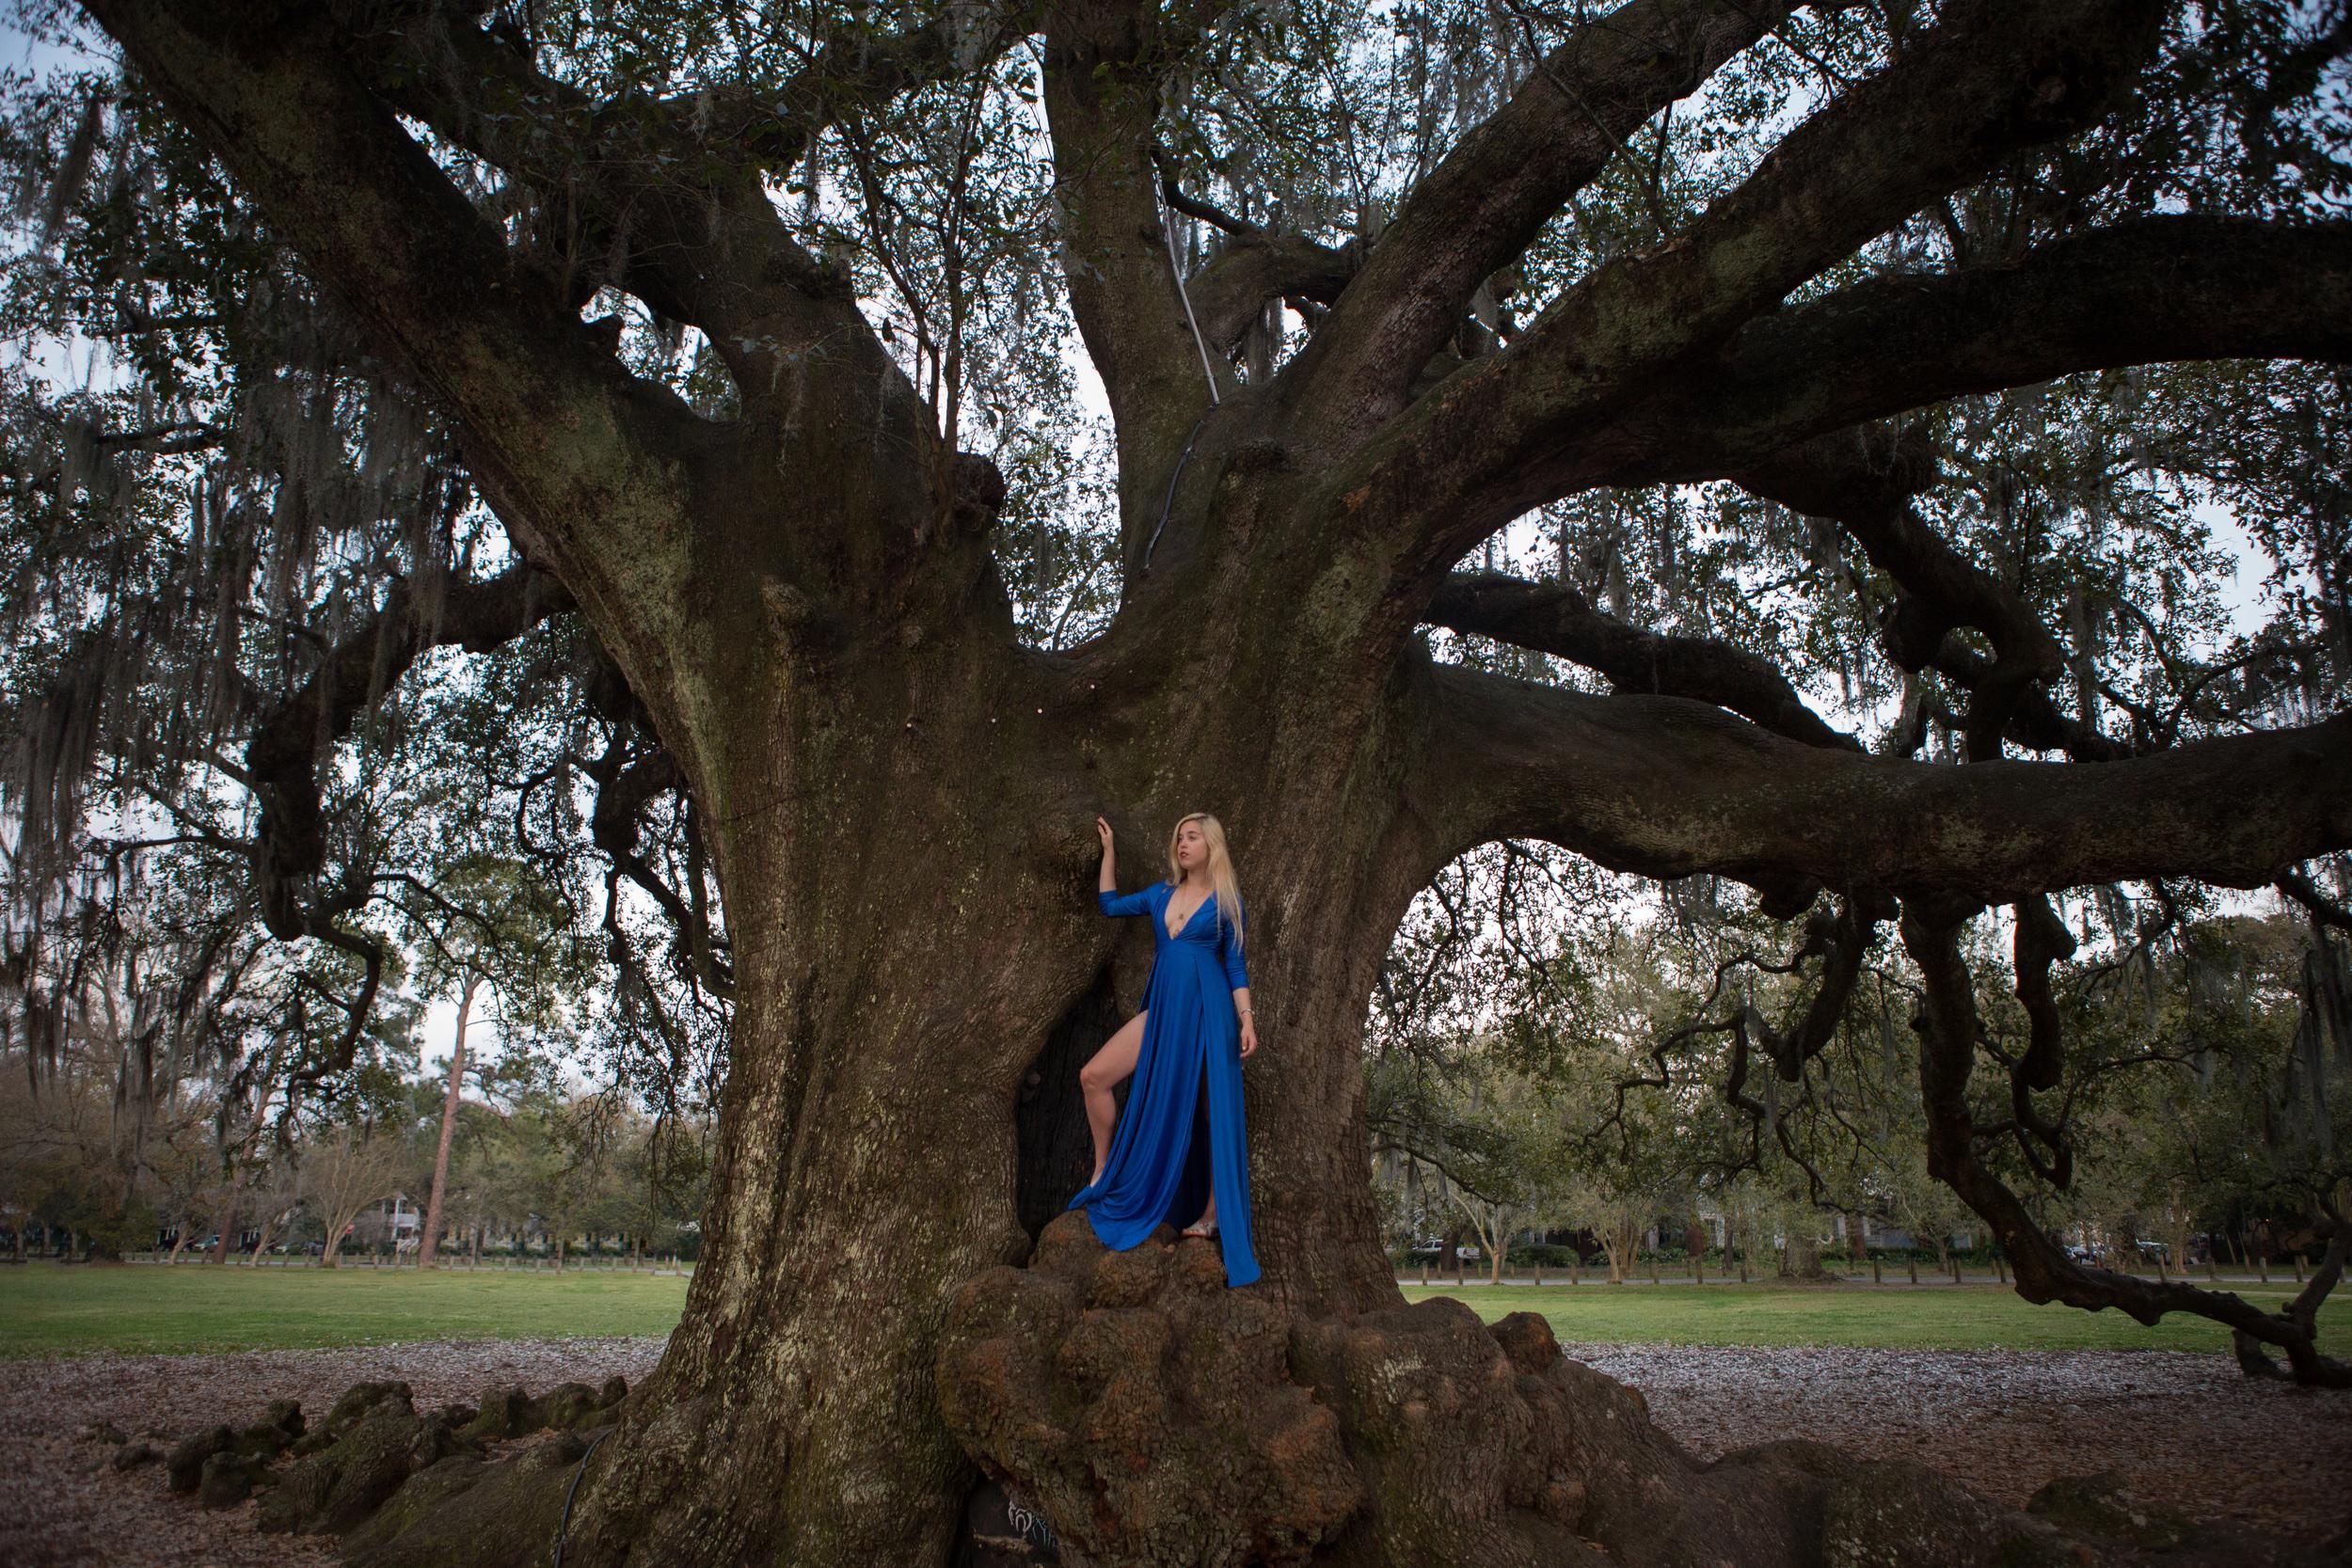 AstroBandit_JordanRose-TreeOfLife_NewOrleans_CobaltBlueDress_2.jpg